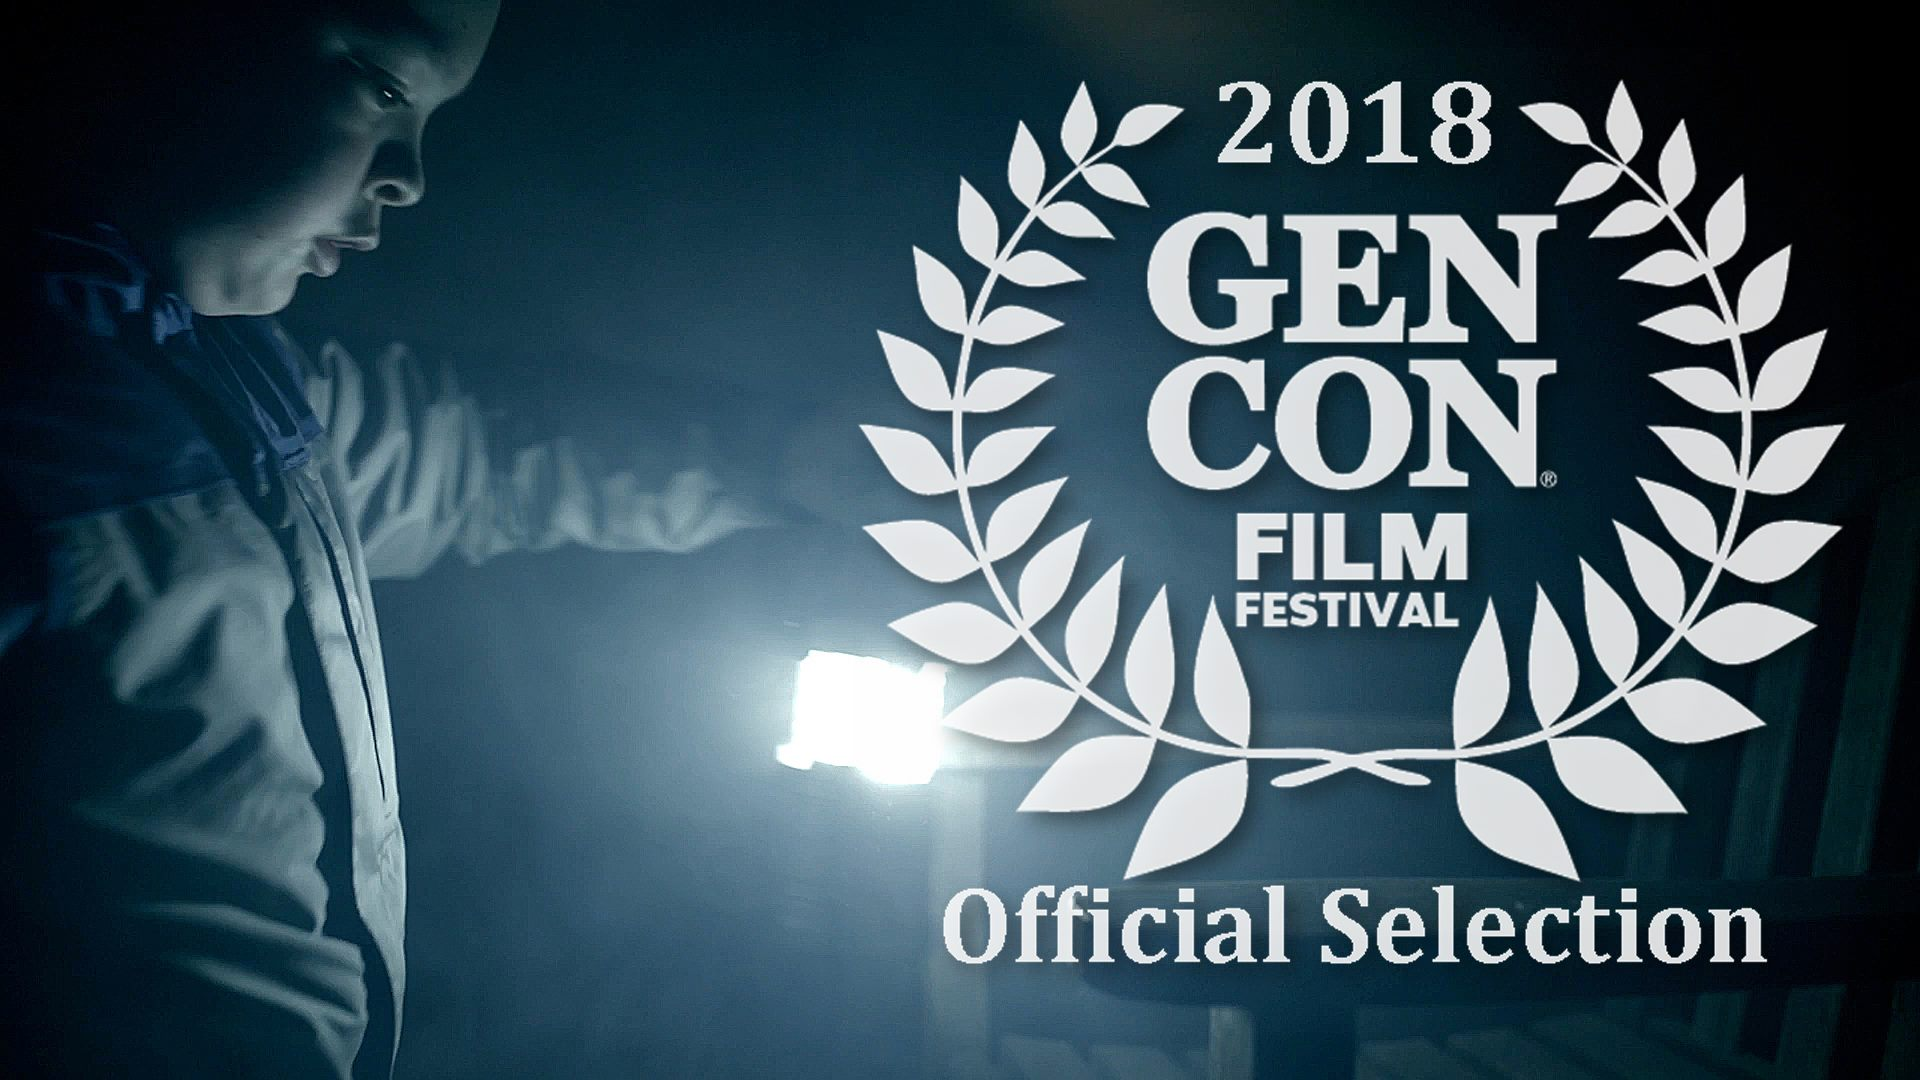 Galmi Gen Con.jpg